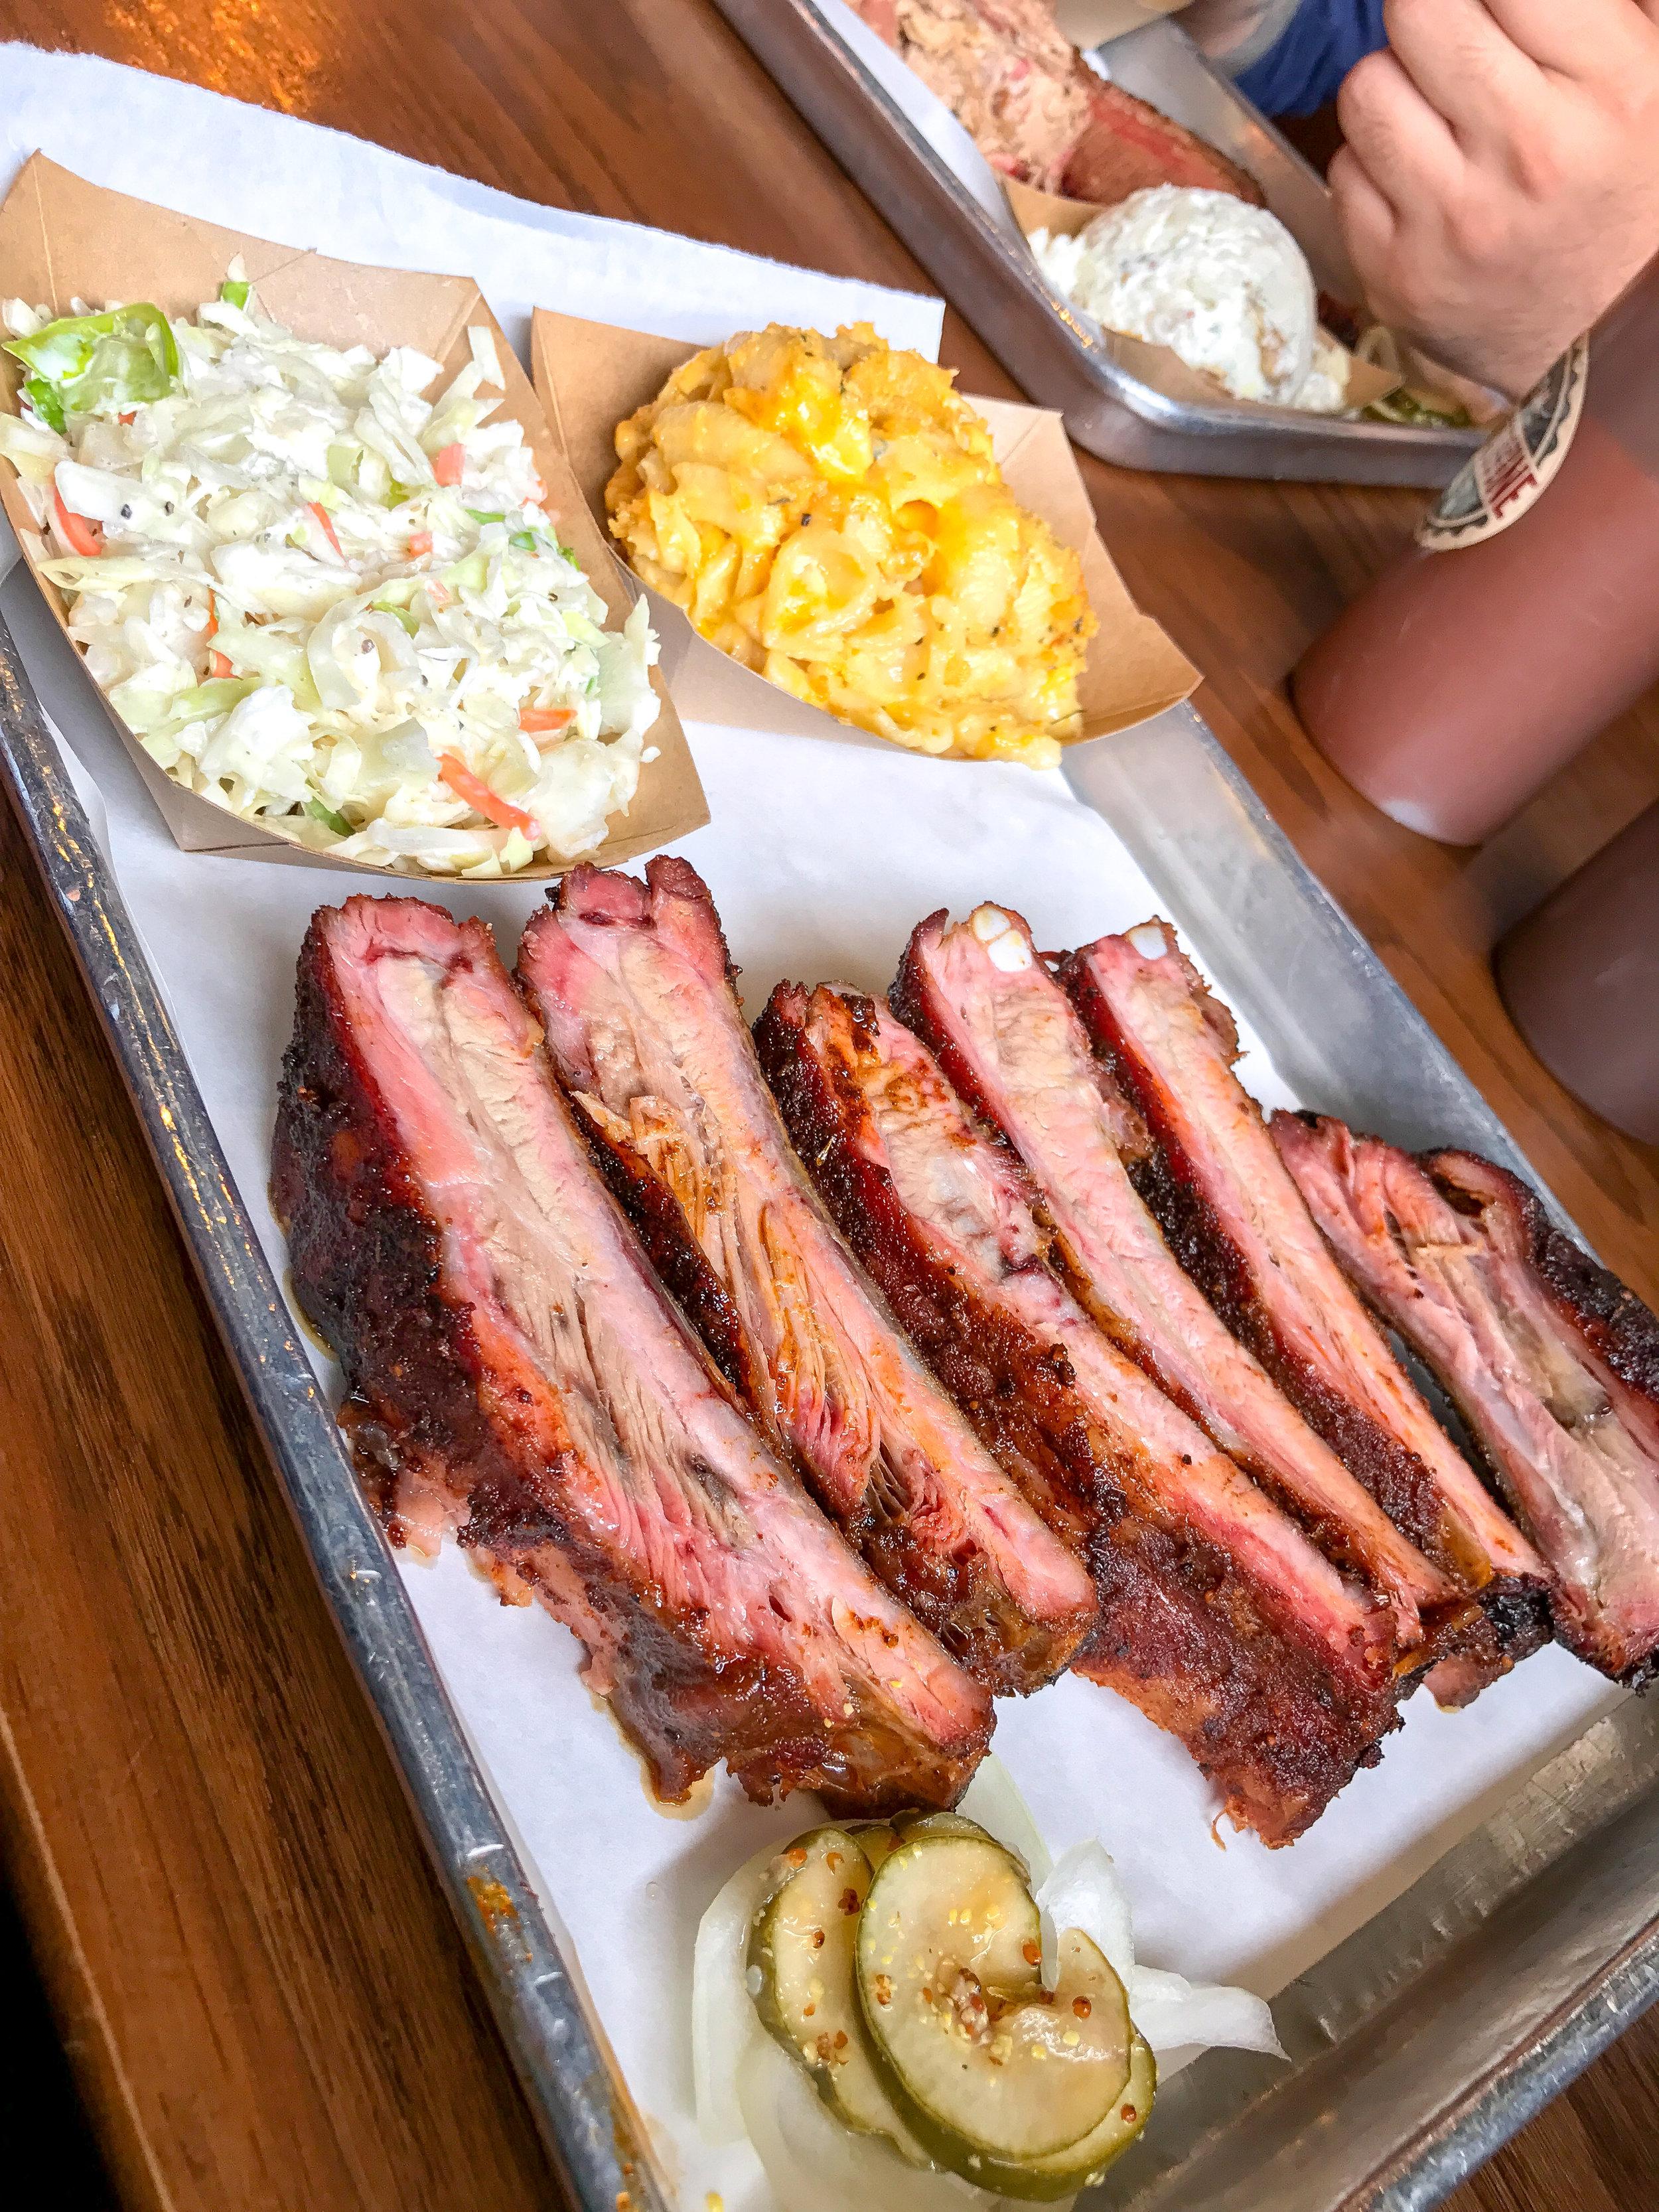 Amazing BBQ ribs in South Carolina